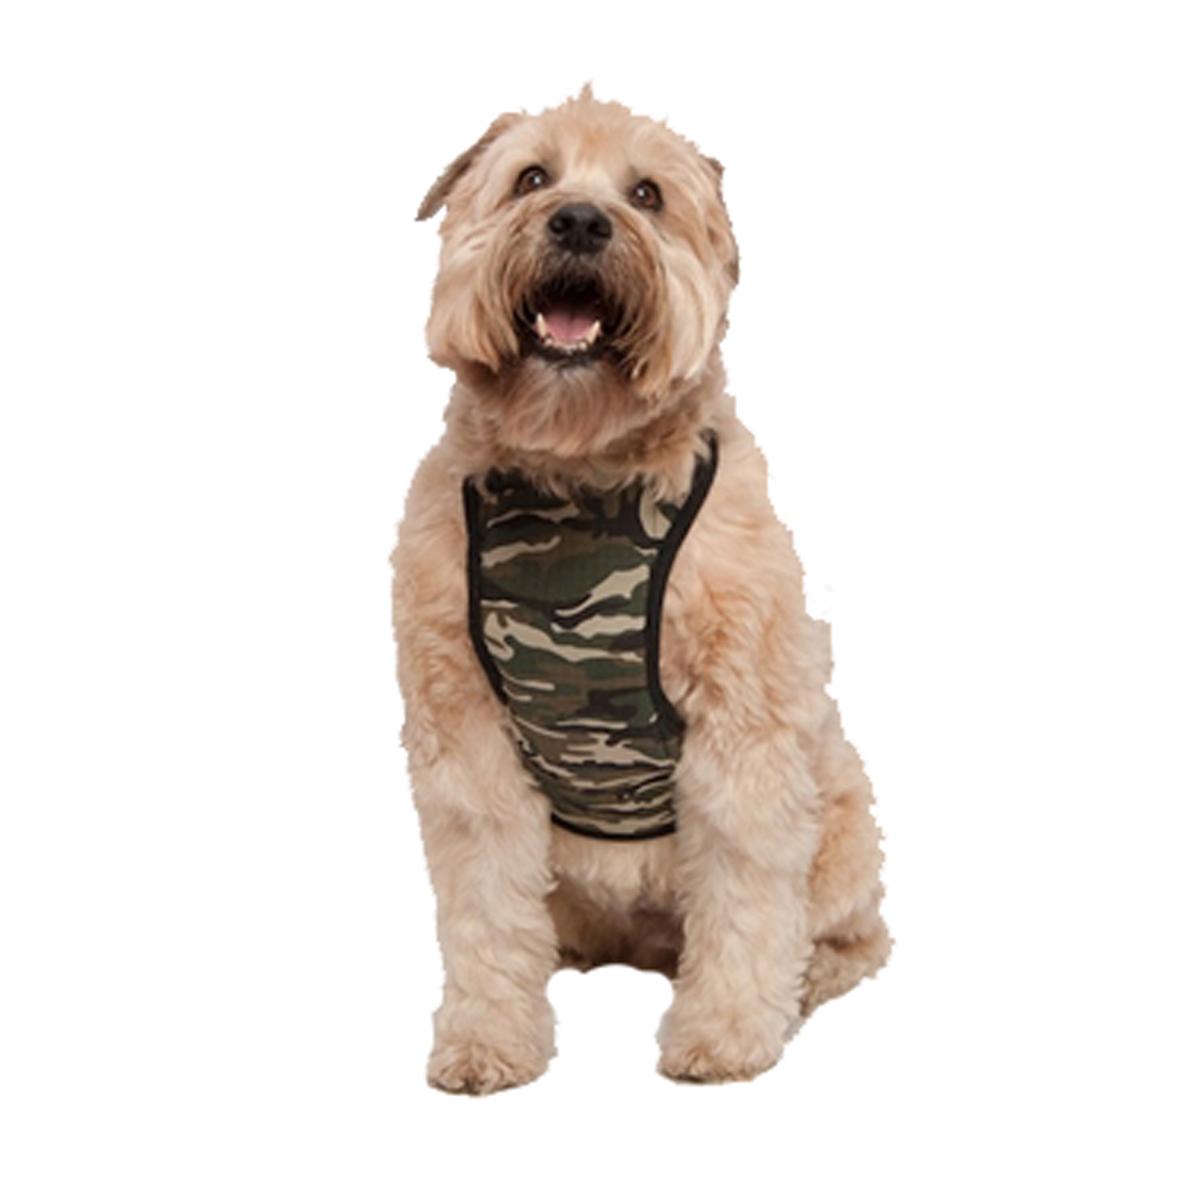 Kumfy Tailz Cools and Warms Mesh Dog Harness ...   BaxterBoo